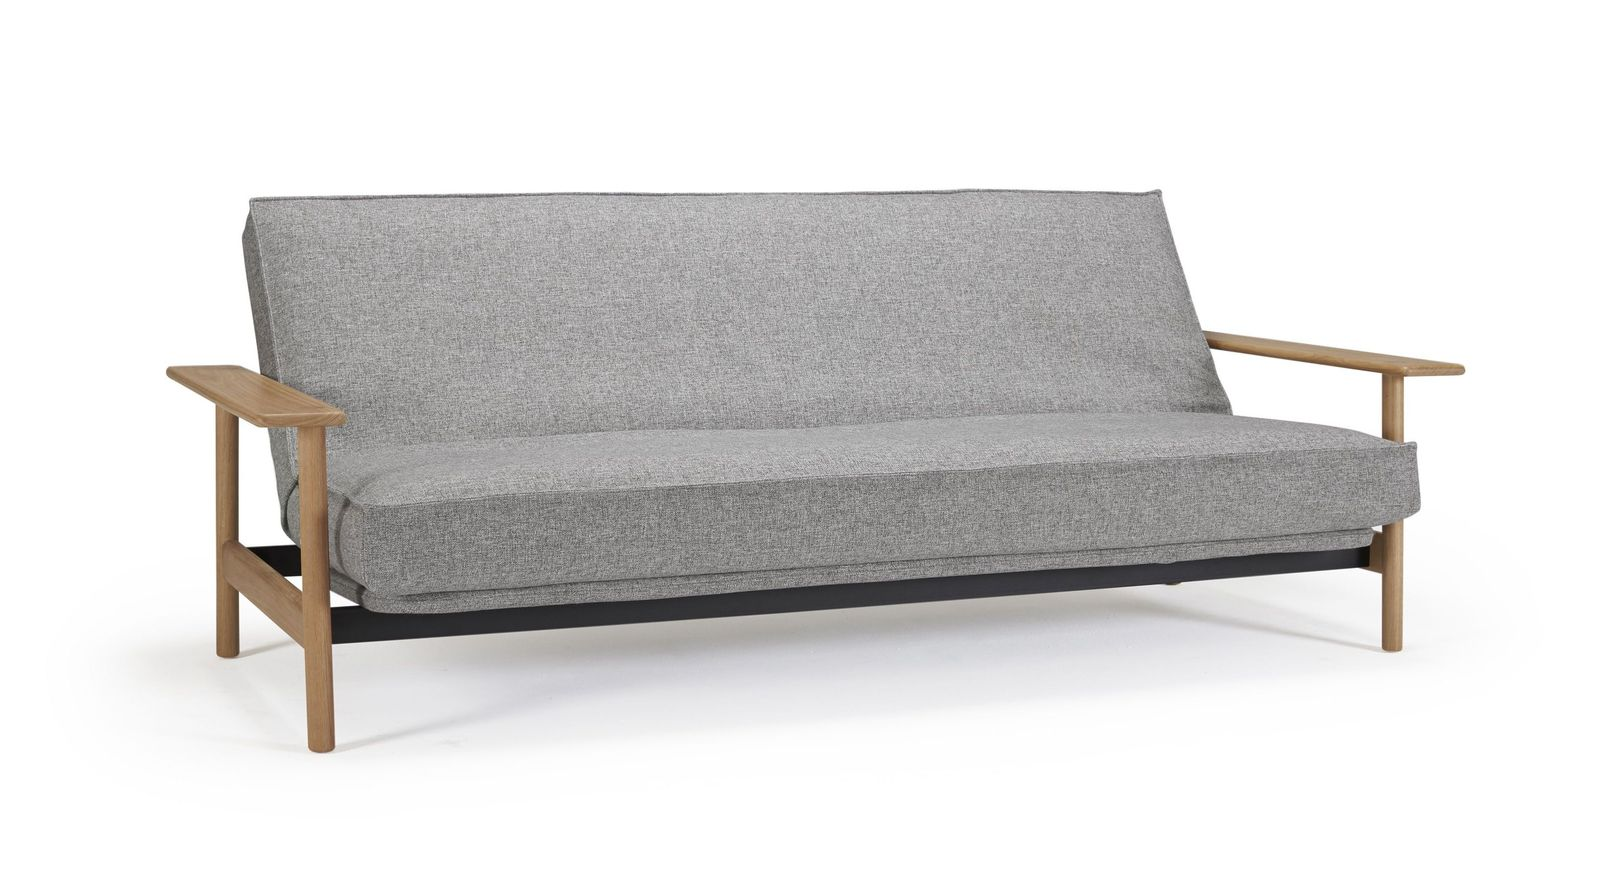 Schlafsofa Barrea aus granitfarbenem Twist-Stoff